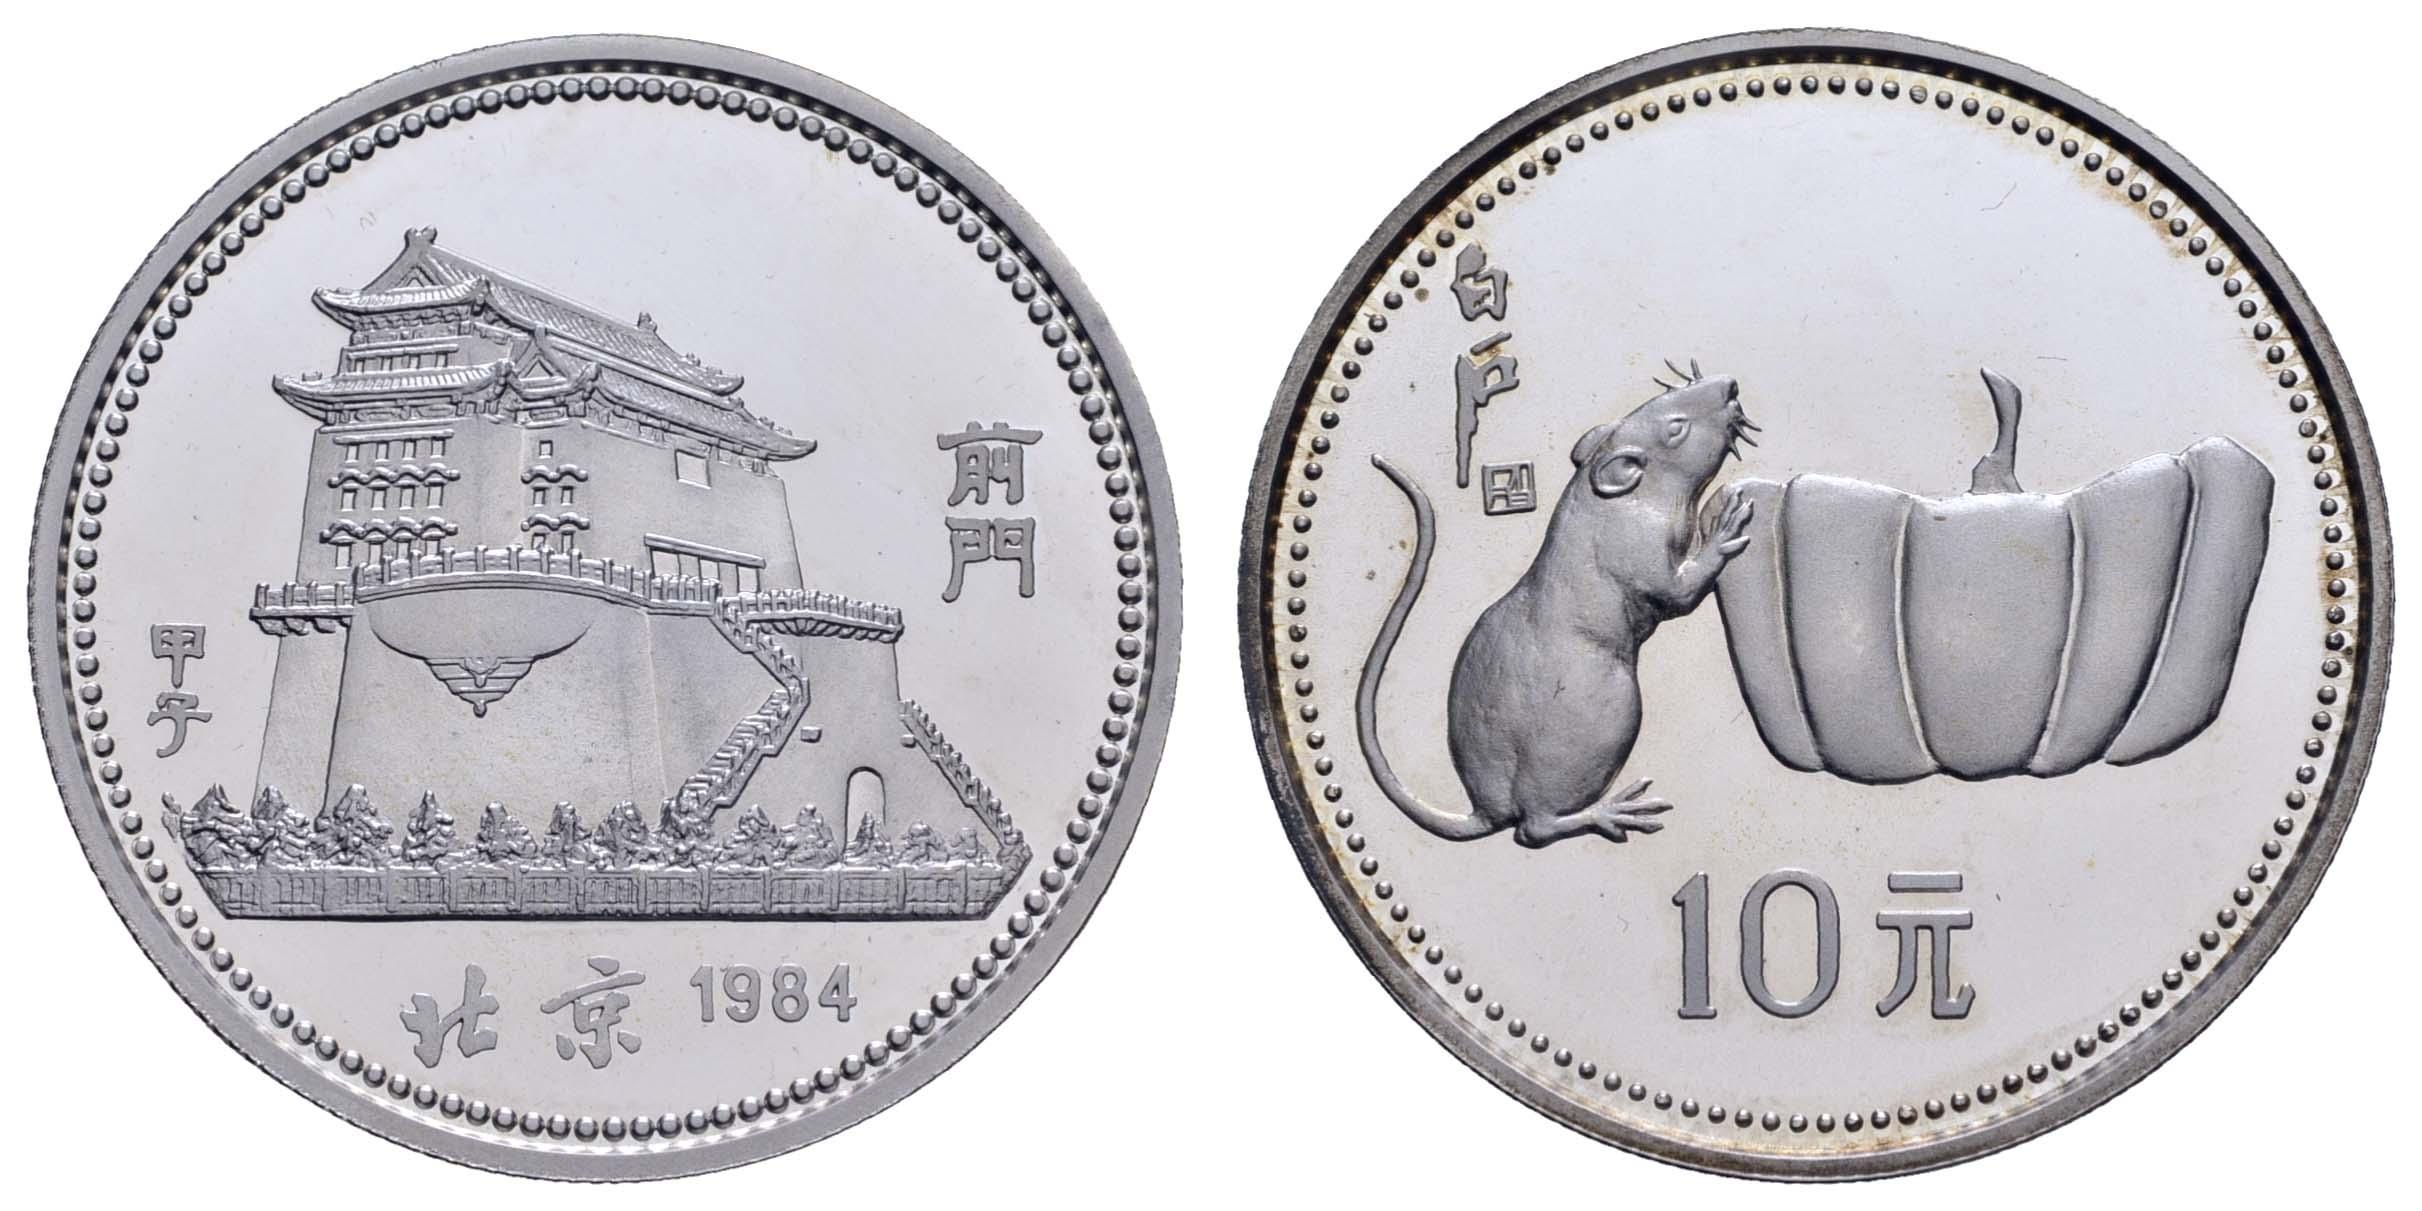 Lot 1903 - übersee China -  Auktionshaus Ulrich Felzmann GmbH & Co. KG Coins single lots